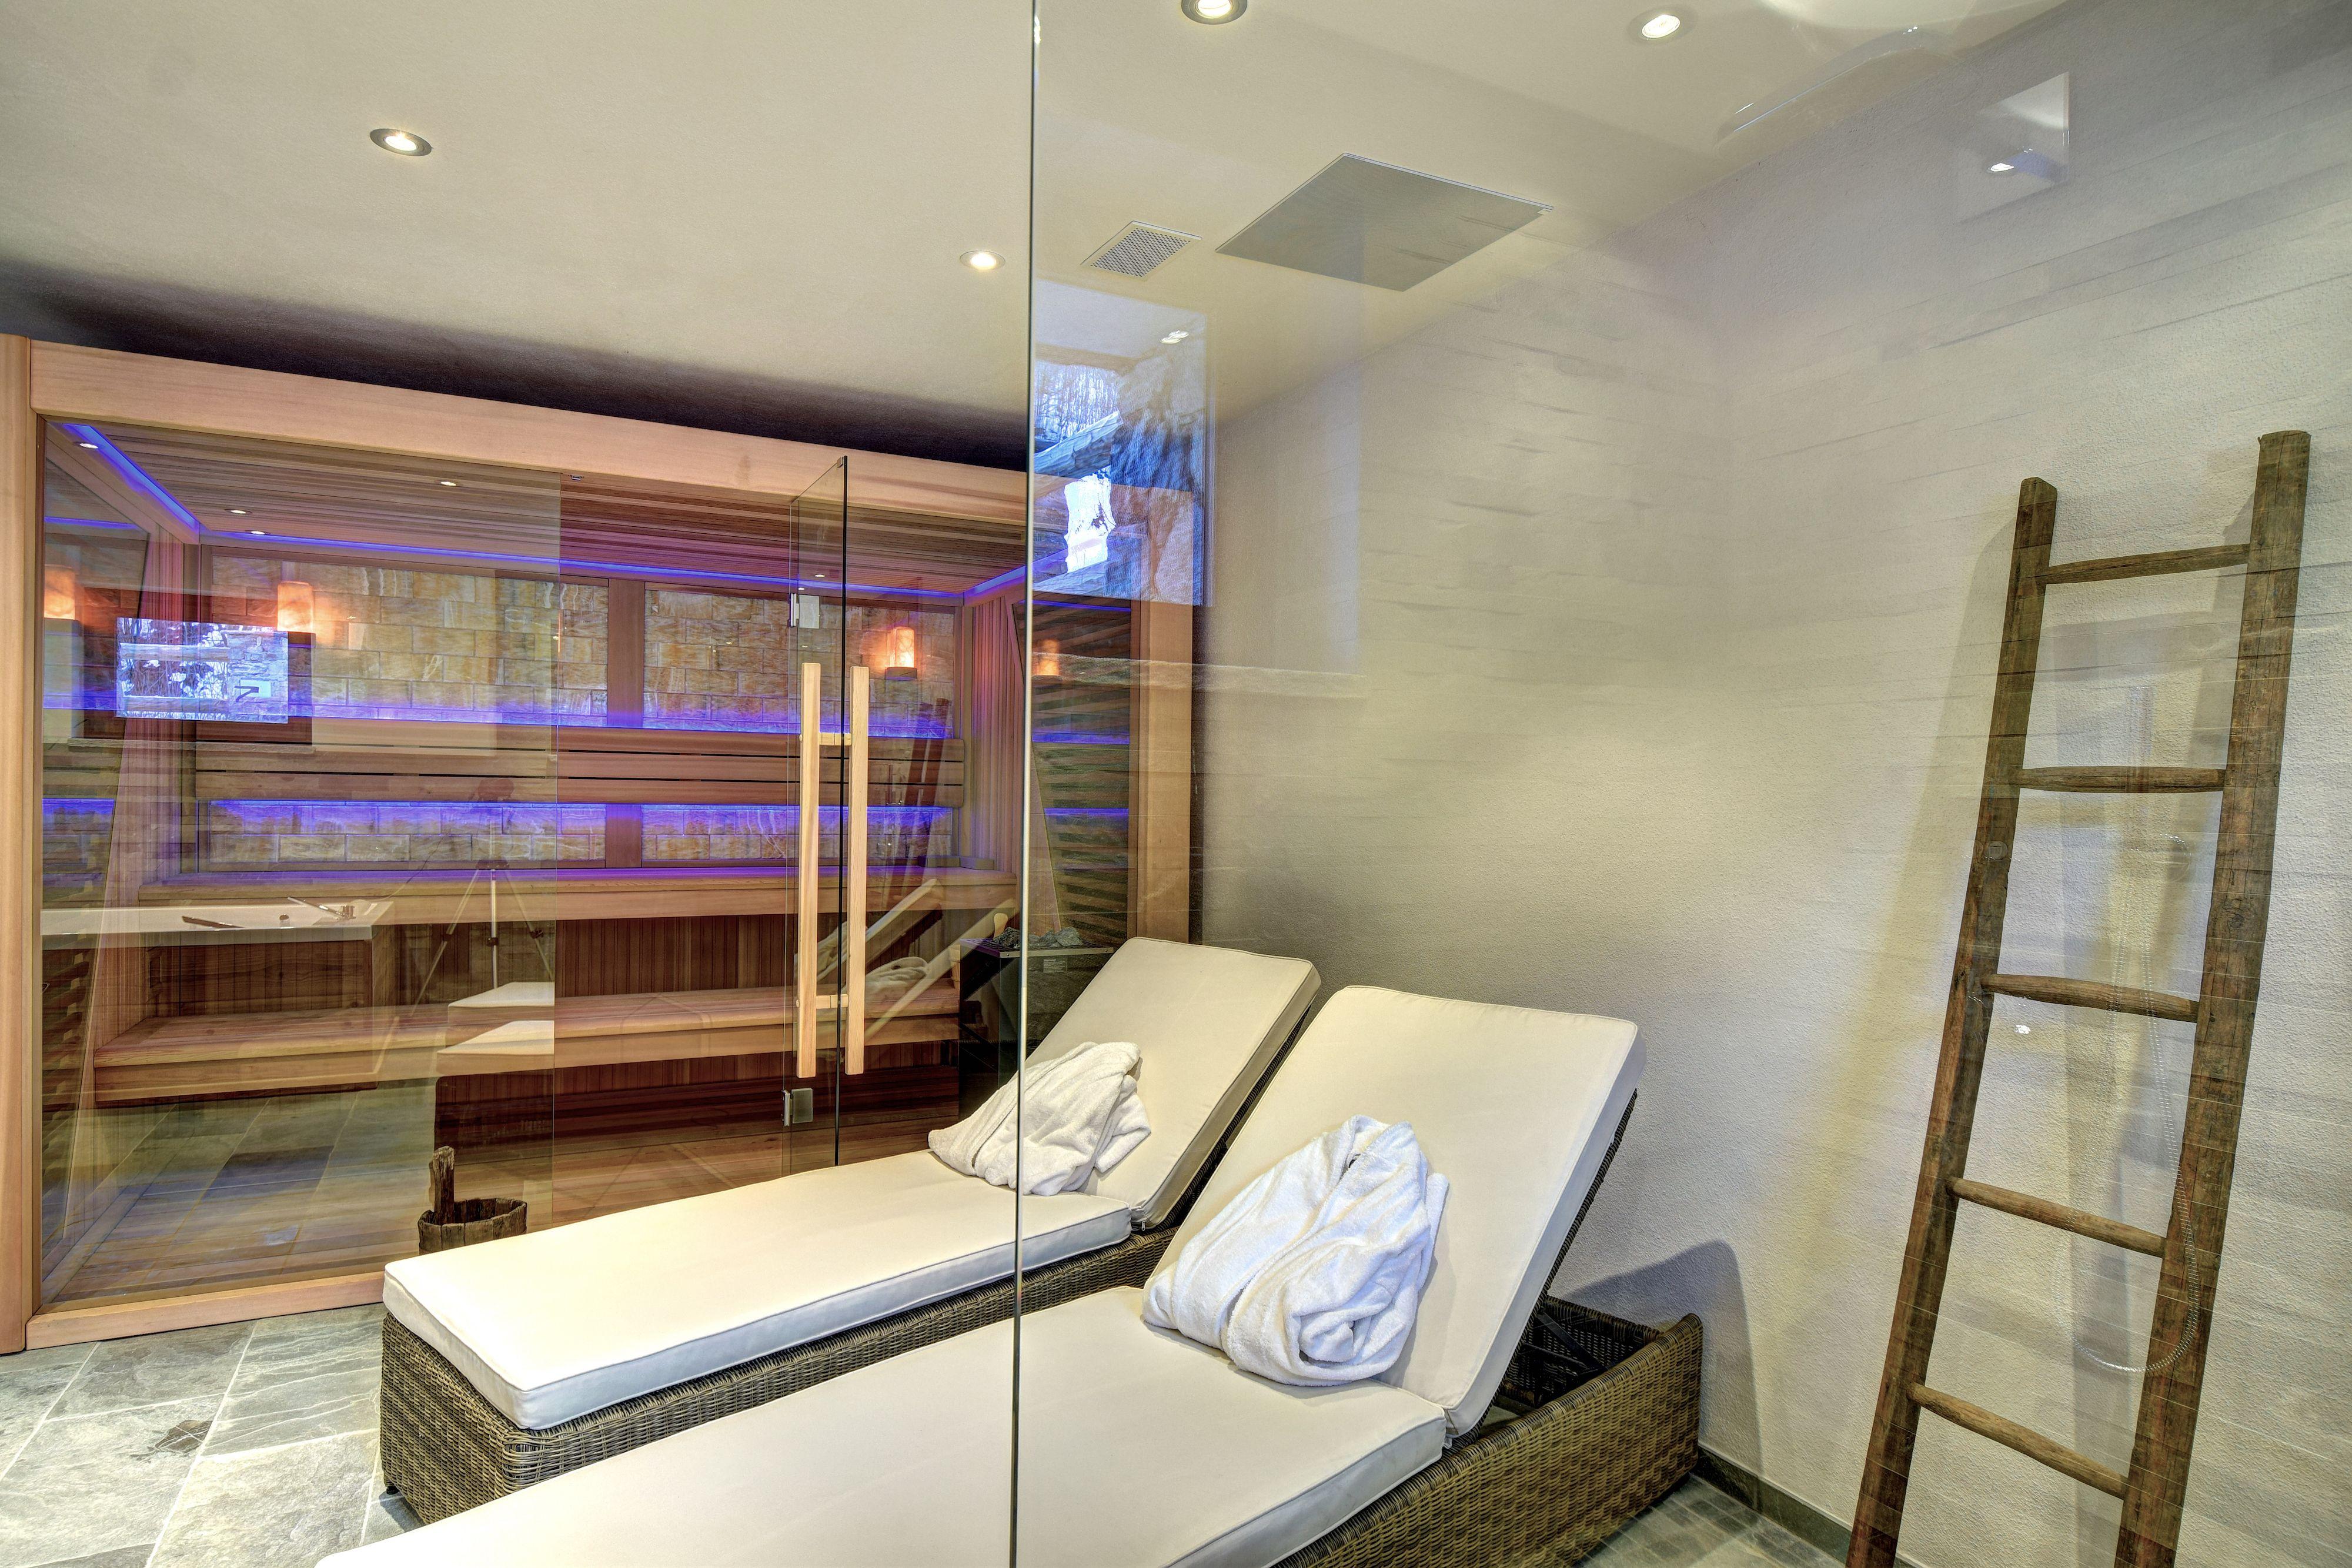 projects london mondrian design spa interior arkitexture futuristic